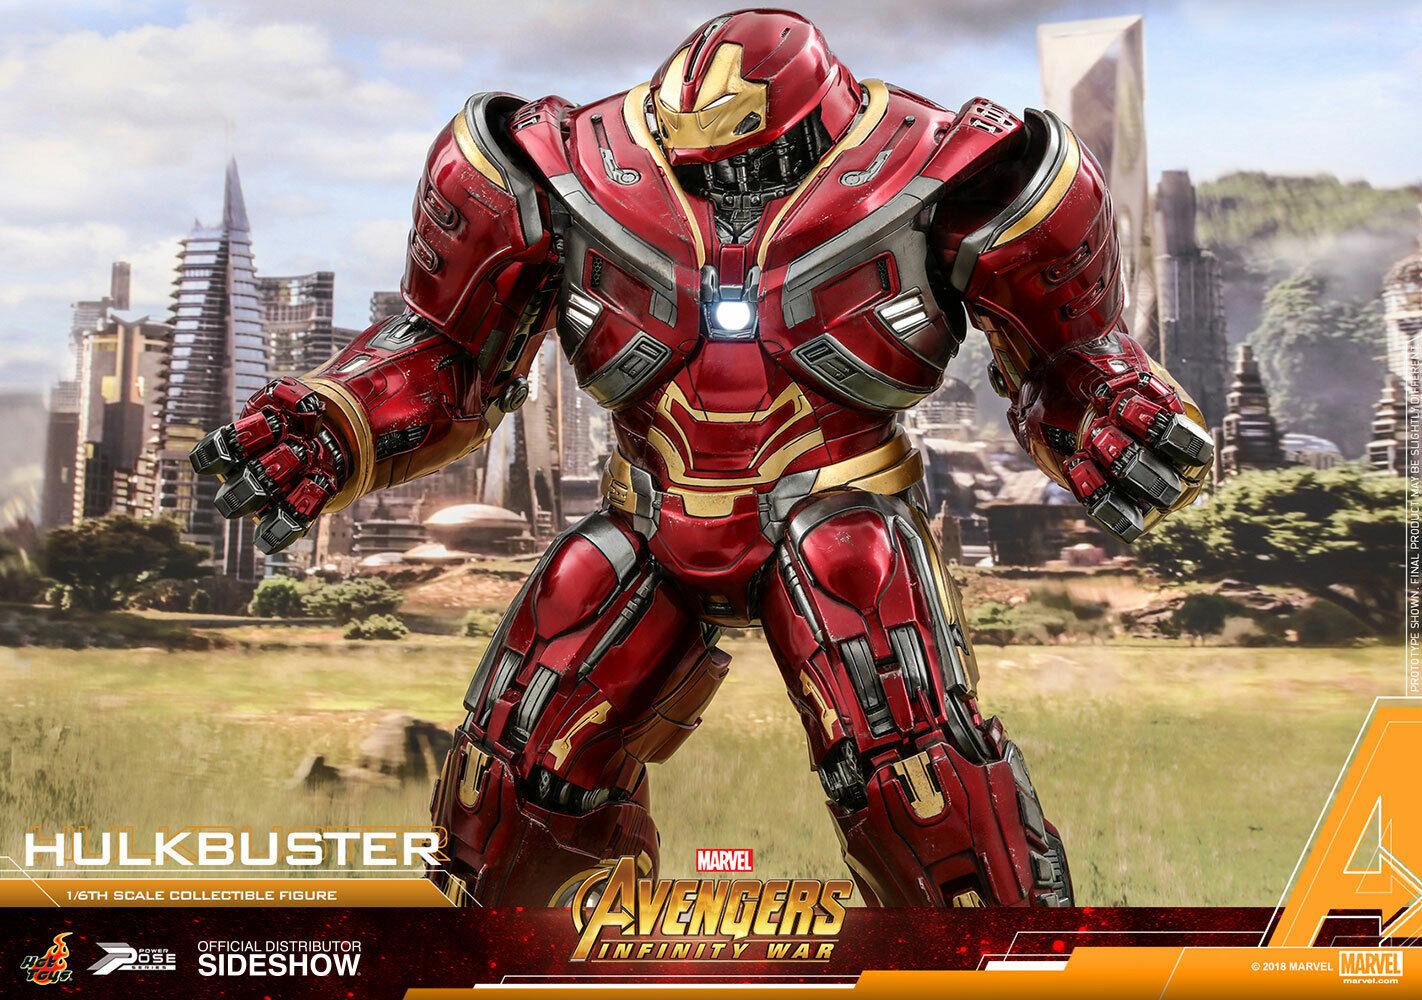 1 6 HOT TOYS PPS005 los Vengadores  Infinito Guerra Hulkbuster Mark 2.0 (50CM) figura